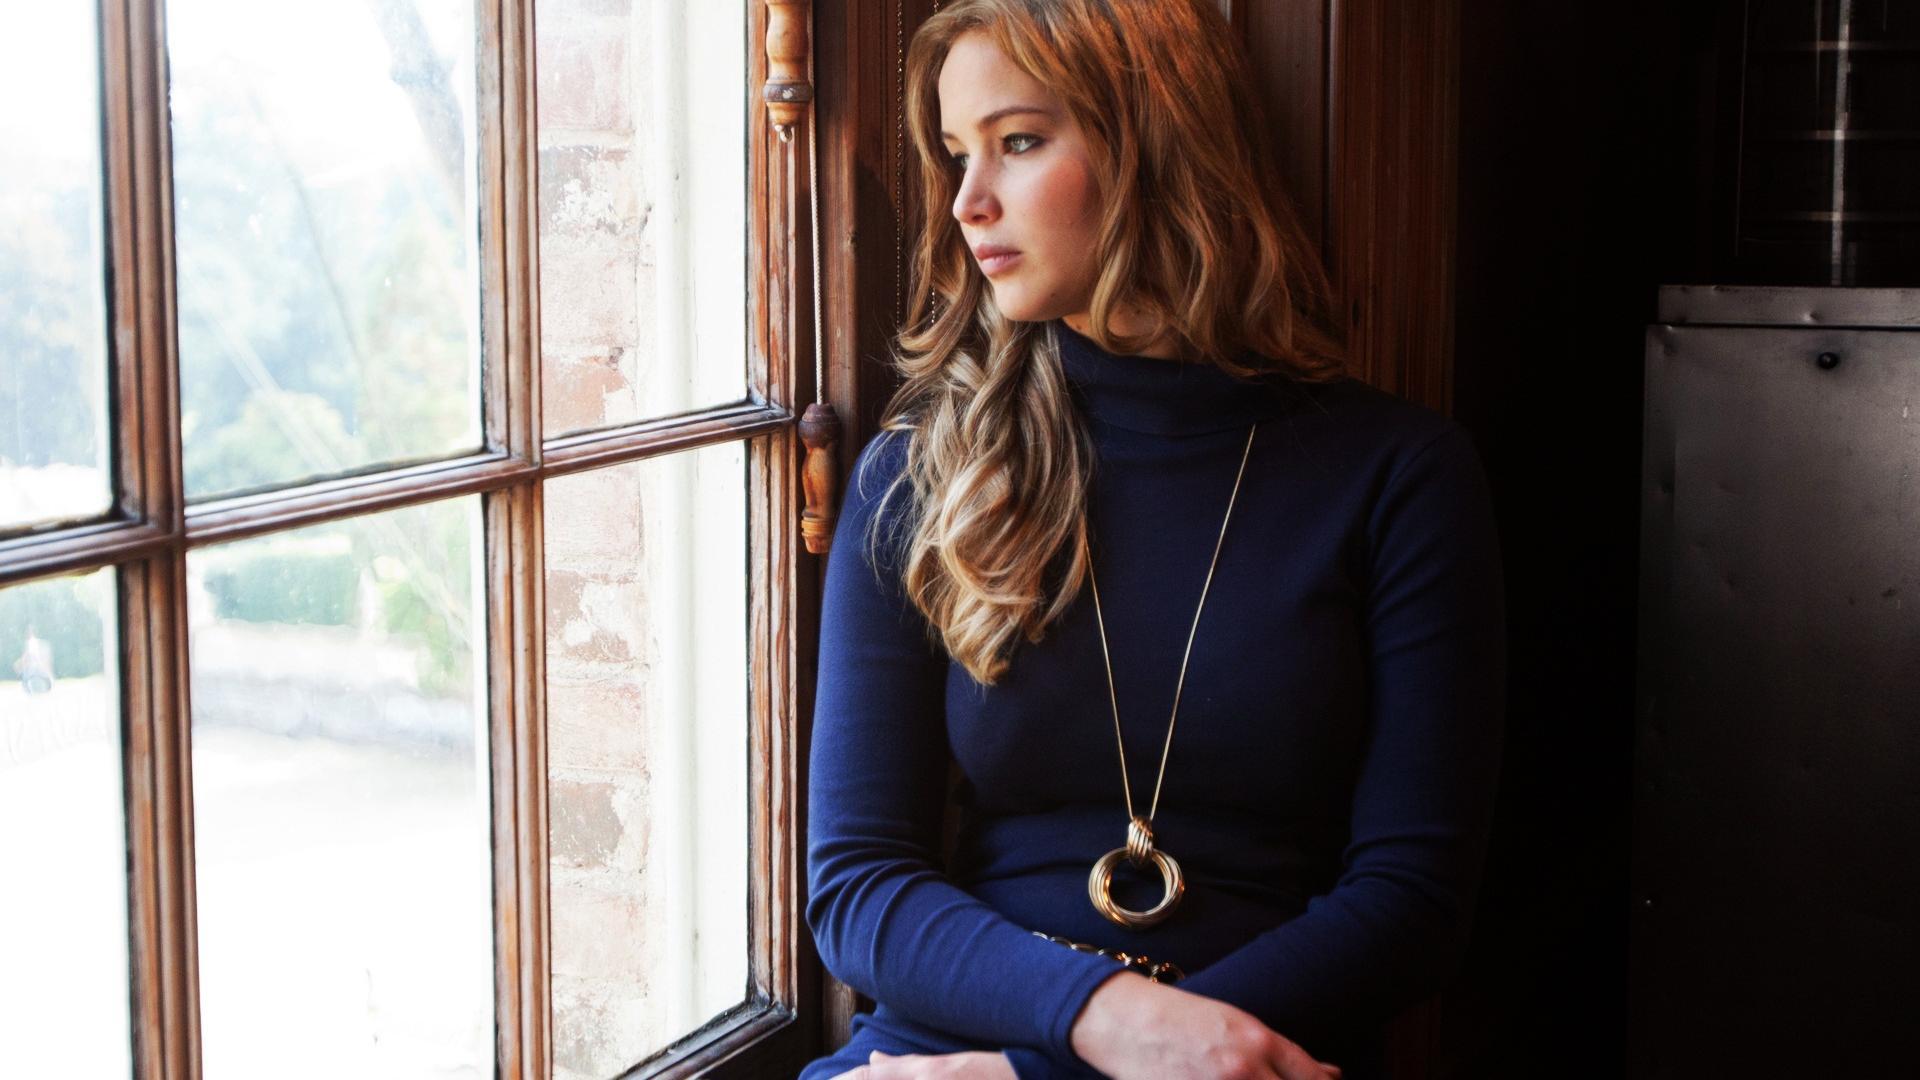 Jennifer Lawrence hd phots & images